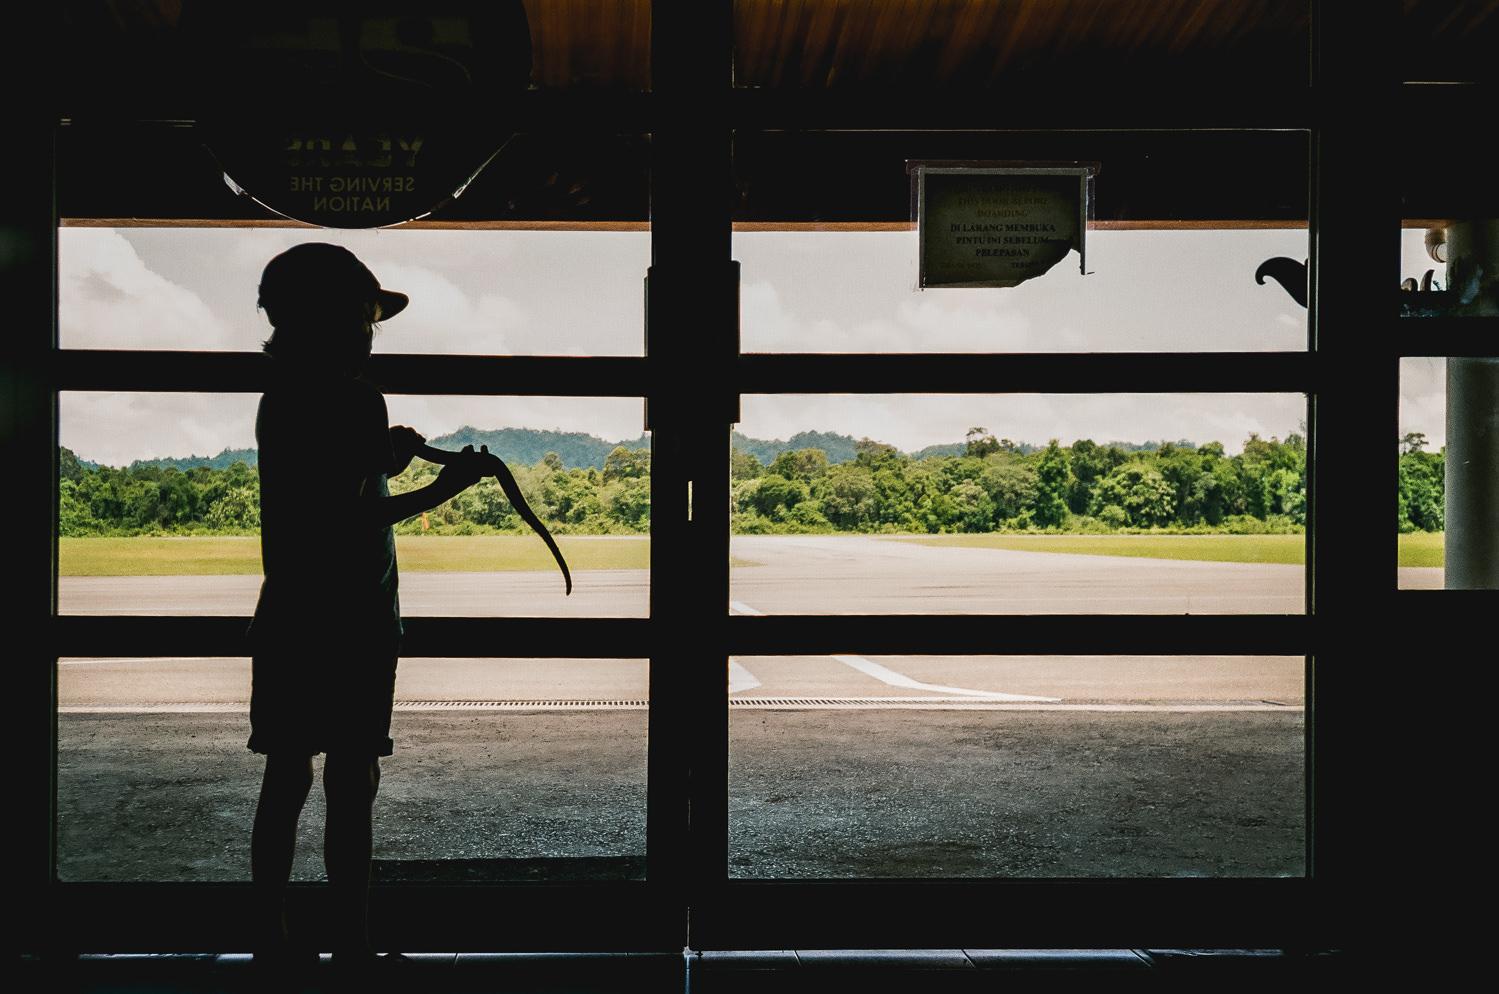 boy at mulu airport